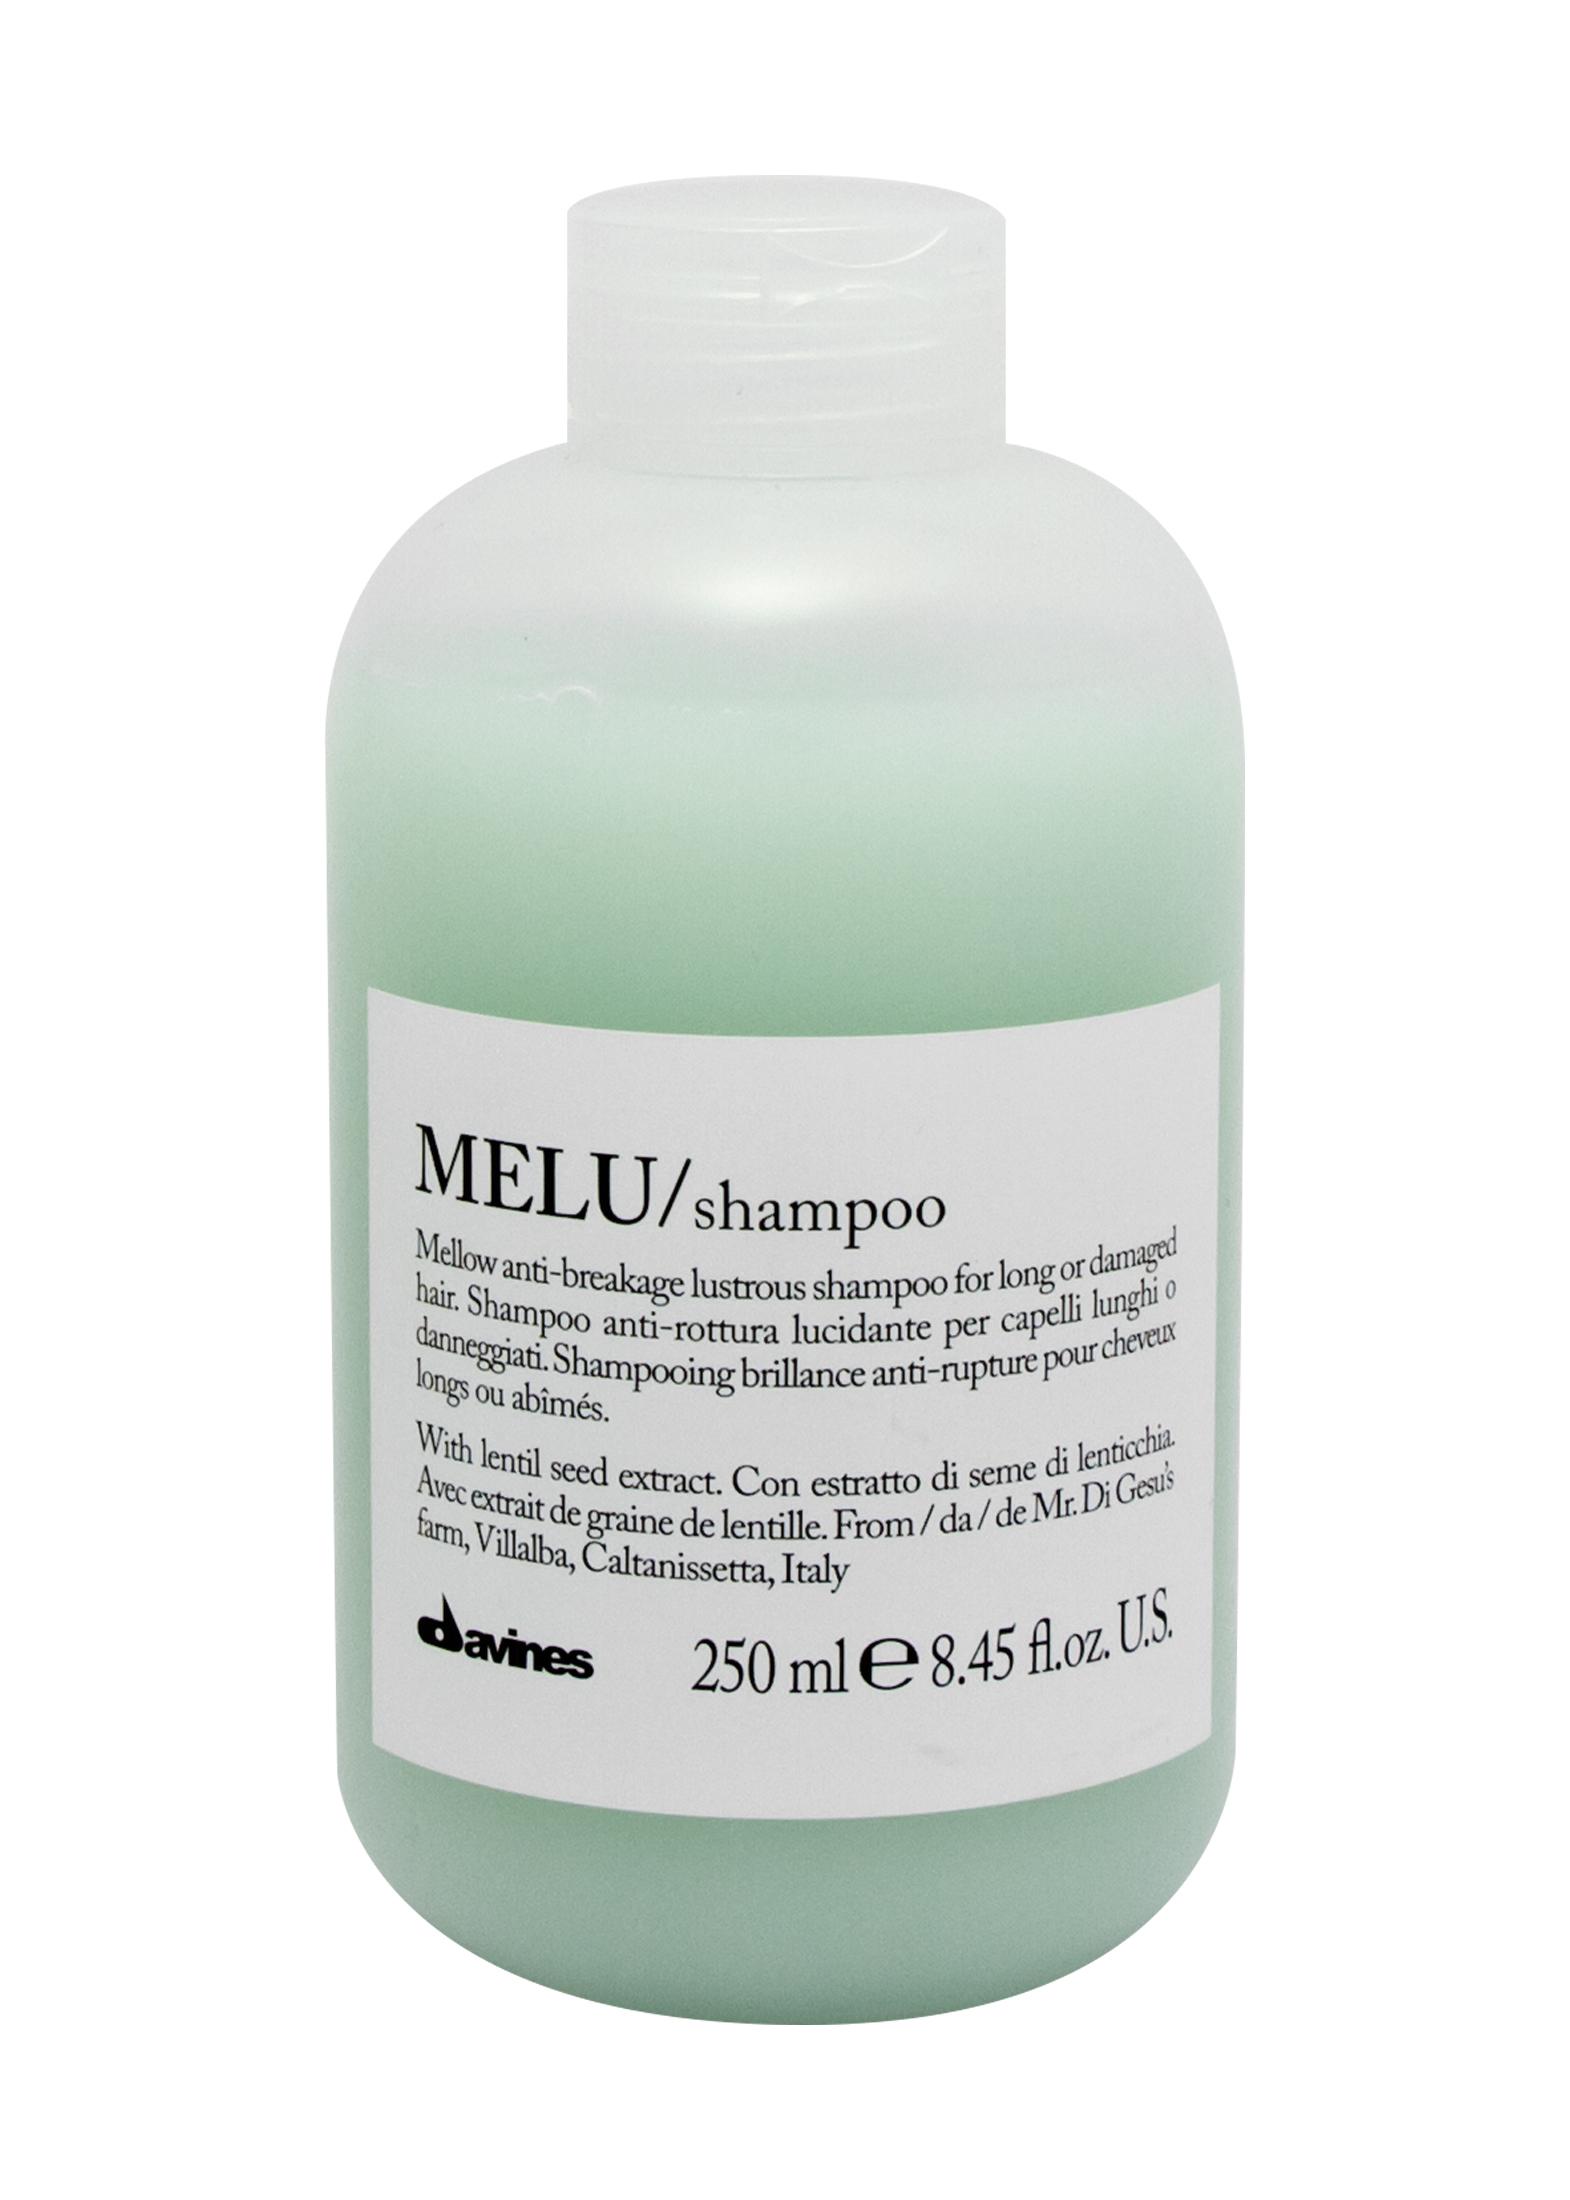 DEHC MELU Shampoo 250ml image number 0